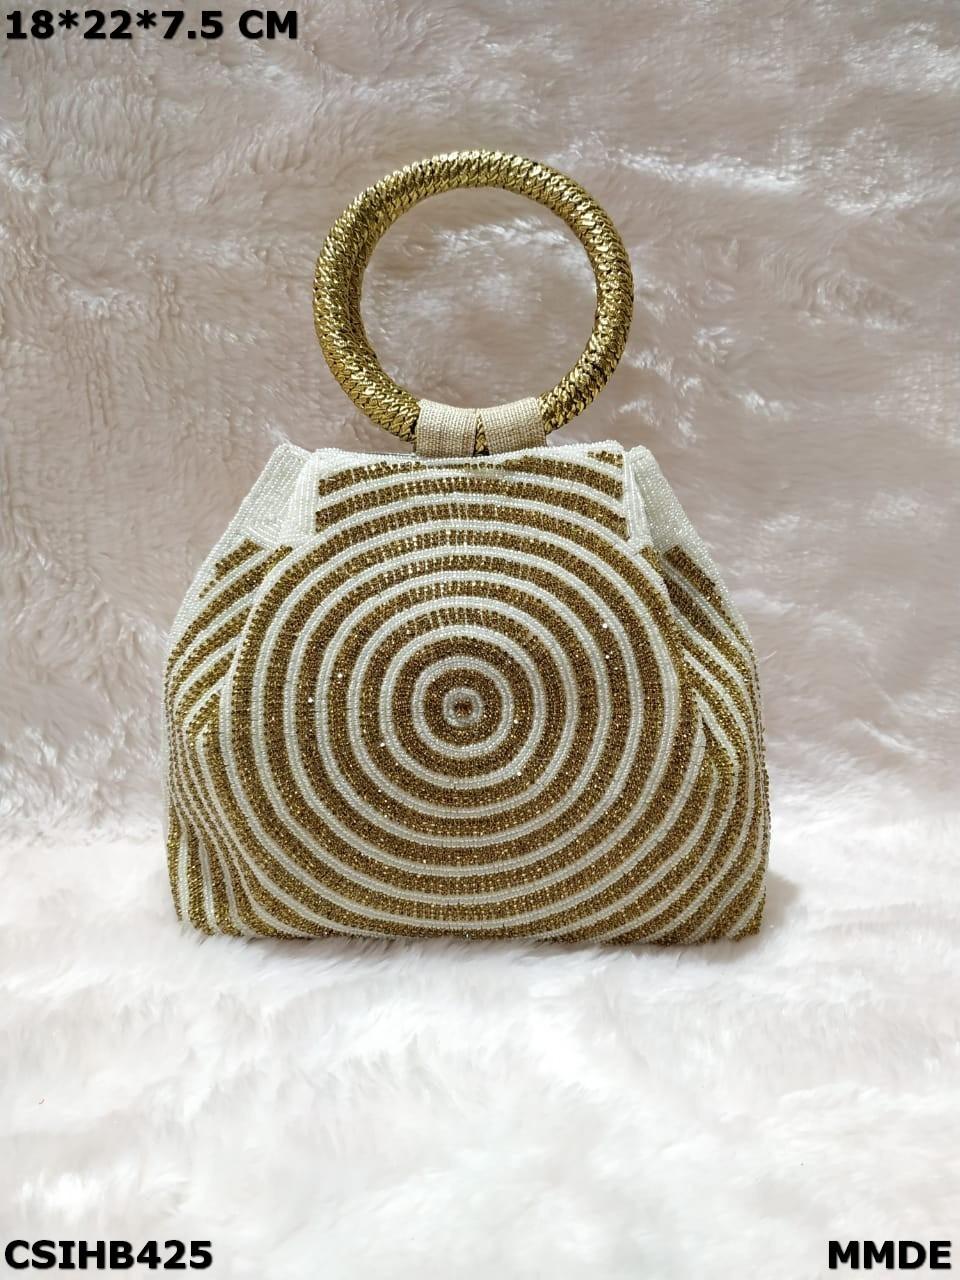 Stonework Handbag